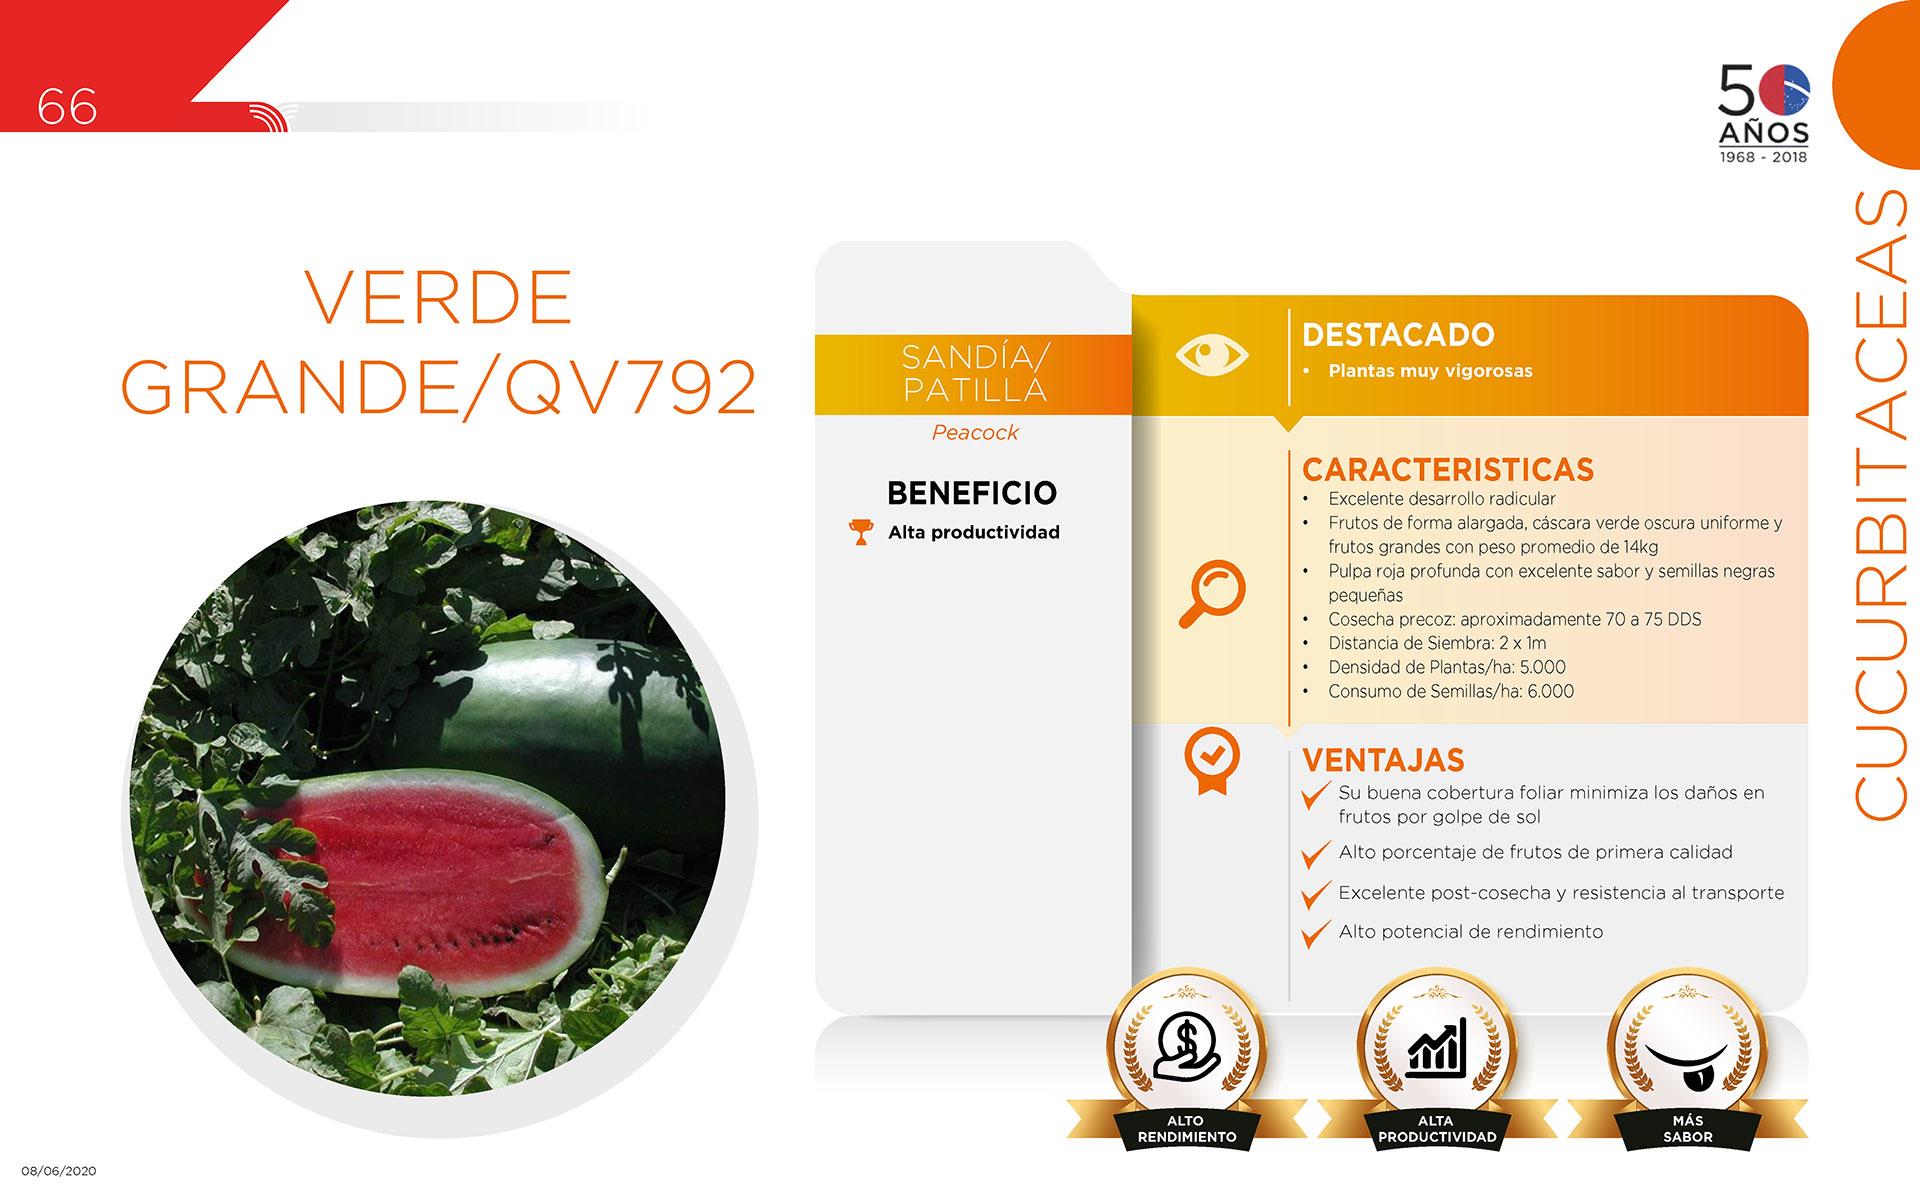 Verde Grande/QV792 - Cucurbitaceas